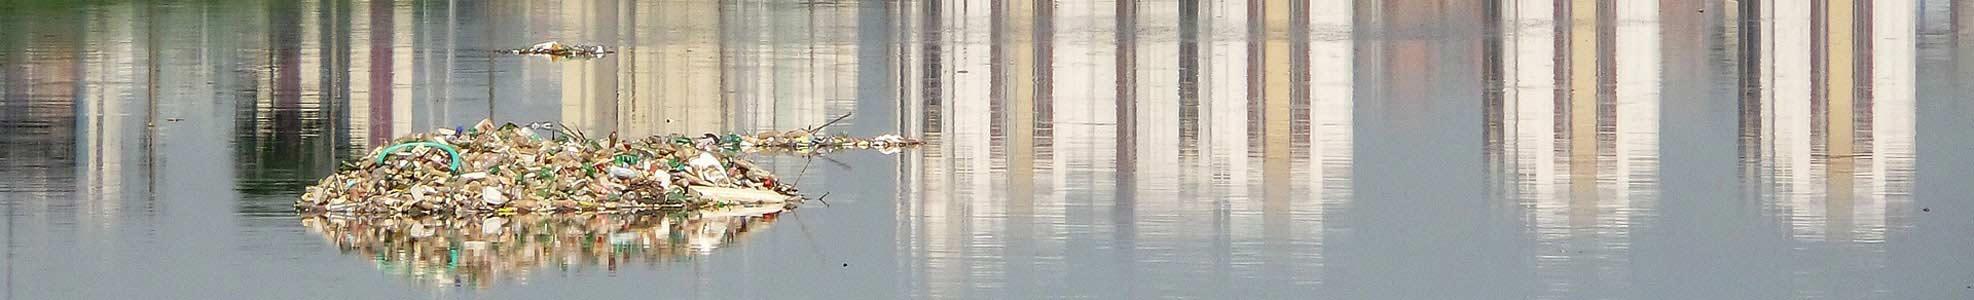 Floating debris containment boom